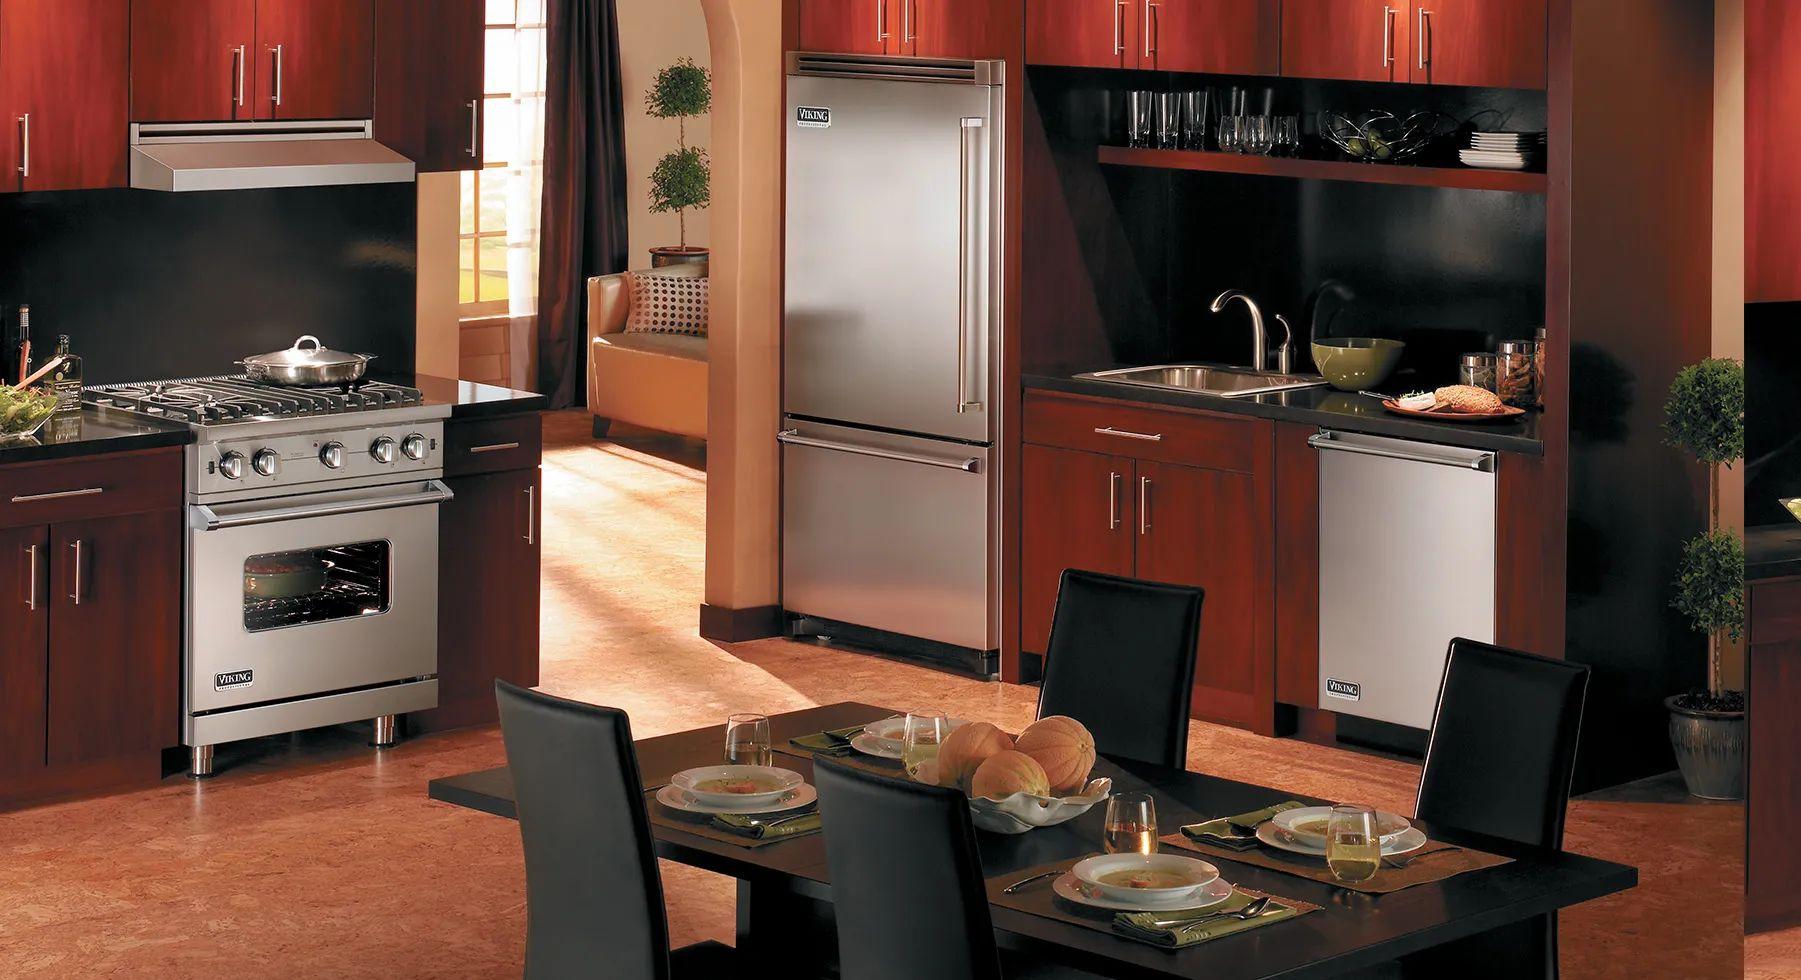 Viking home appliances kitchen appliances mattress